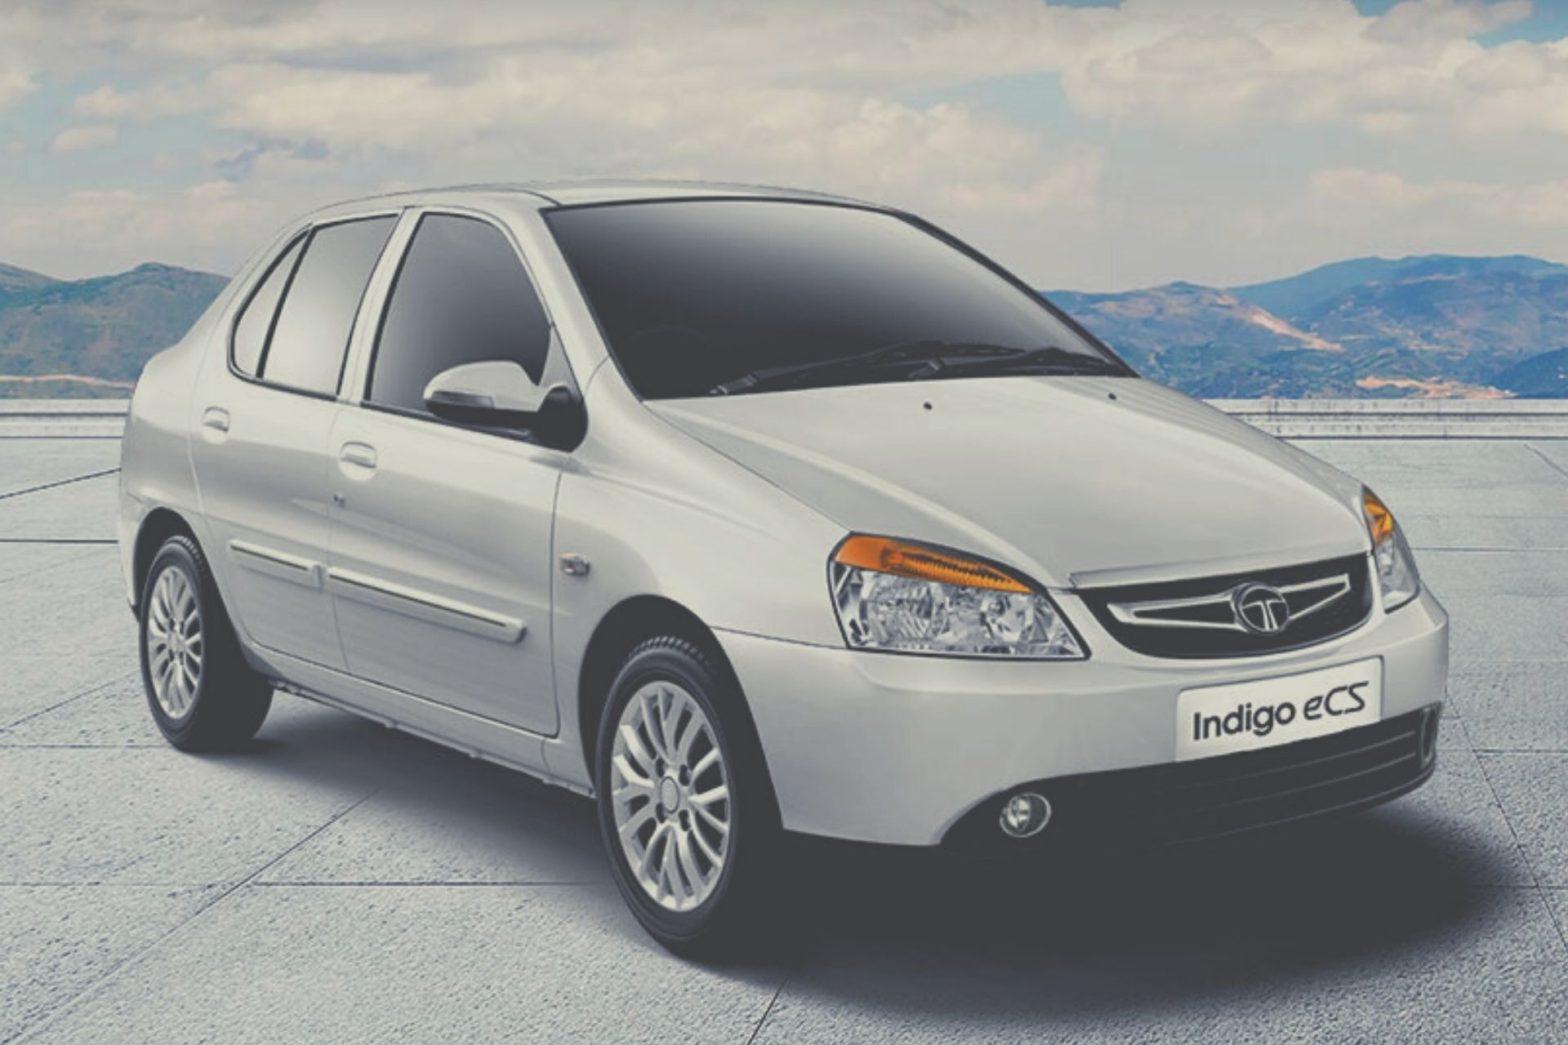 Tata Indigo Car Rental in Hyderabad with Outstation & Local Tariff